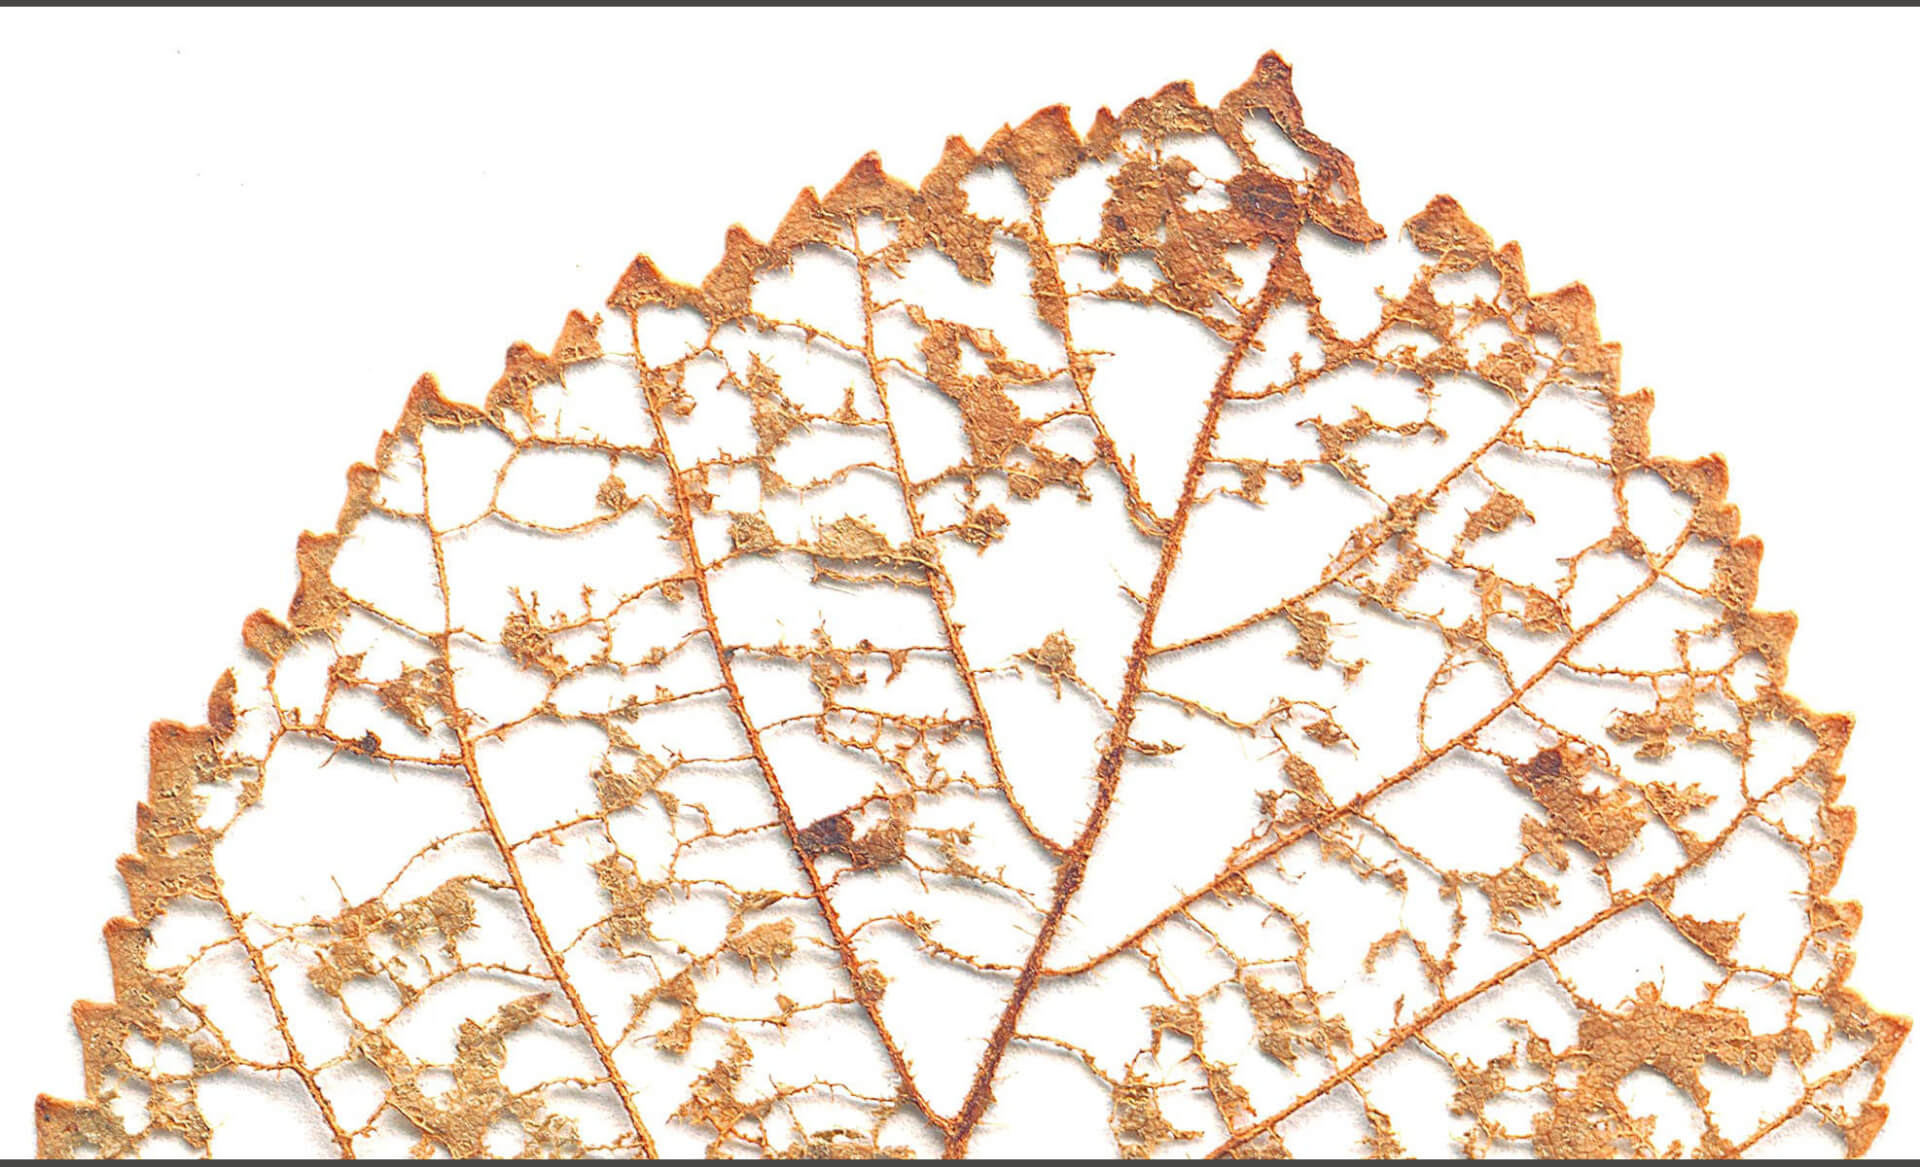 Fall Leaves Layered Doug Garrabrants